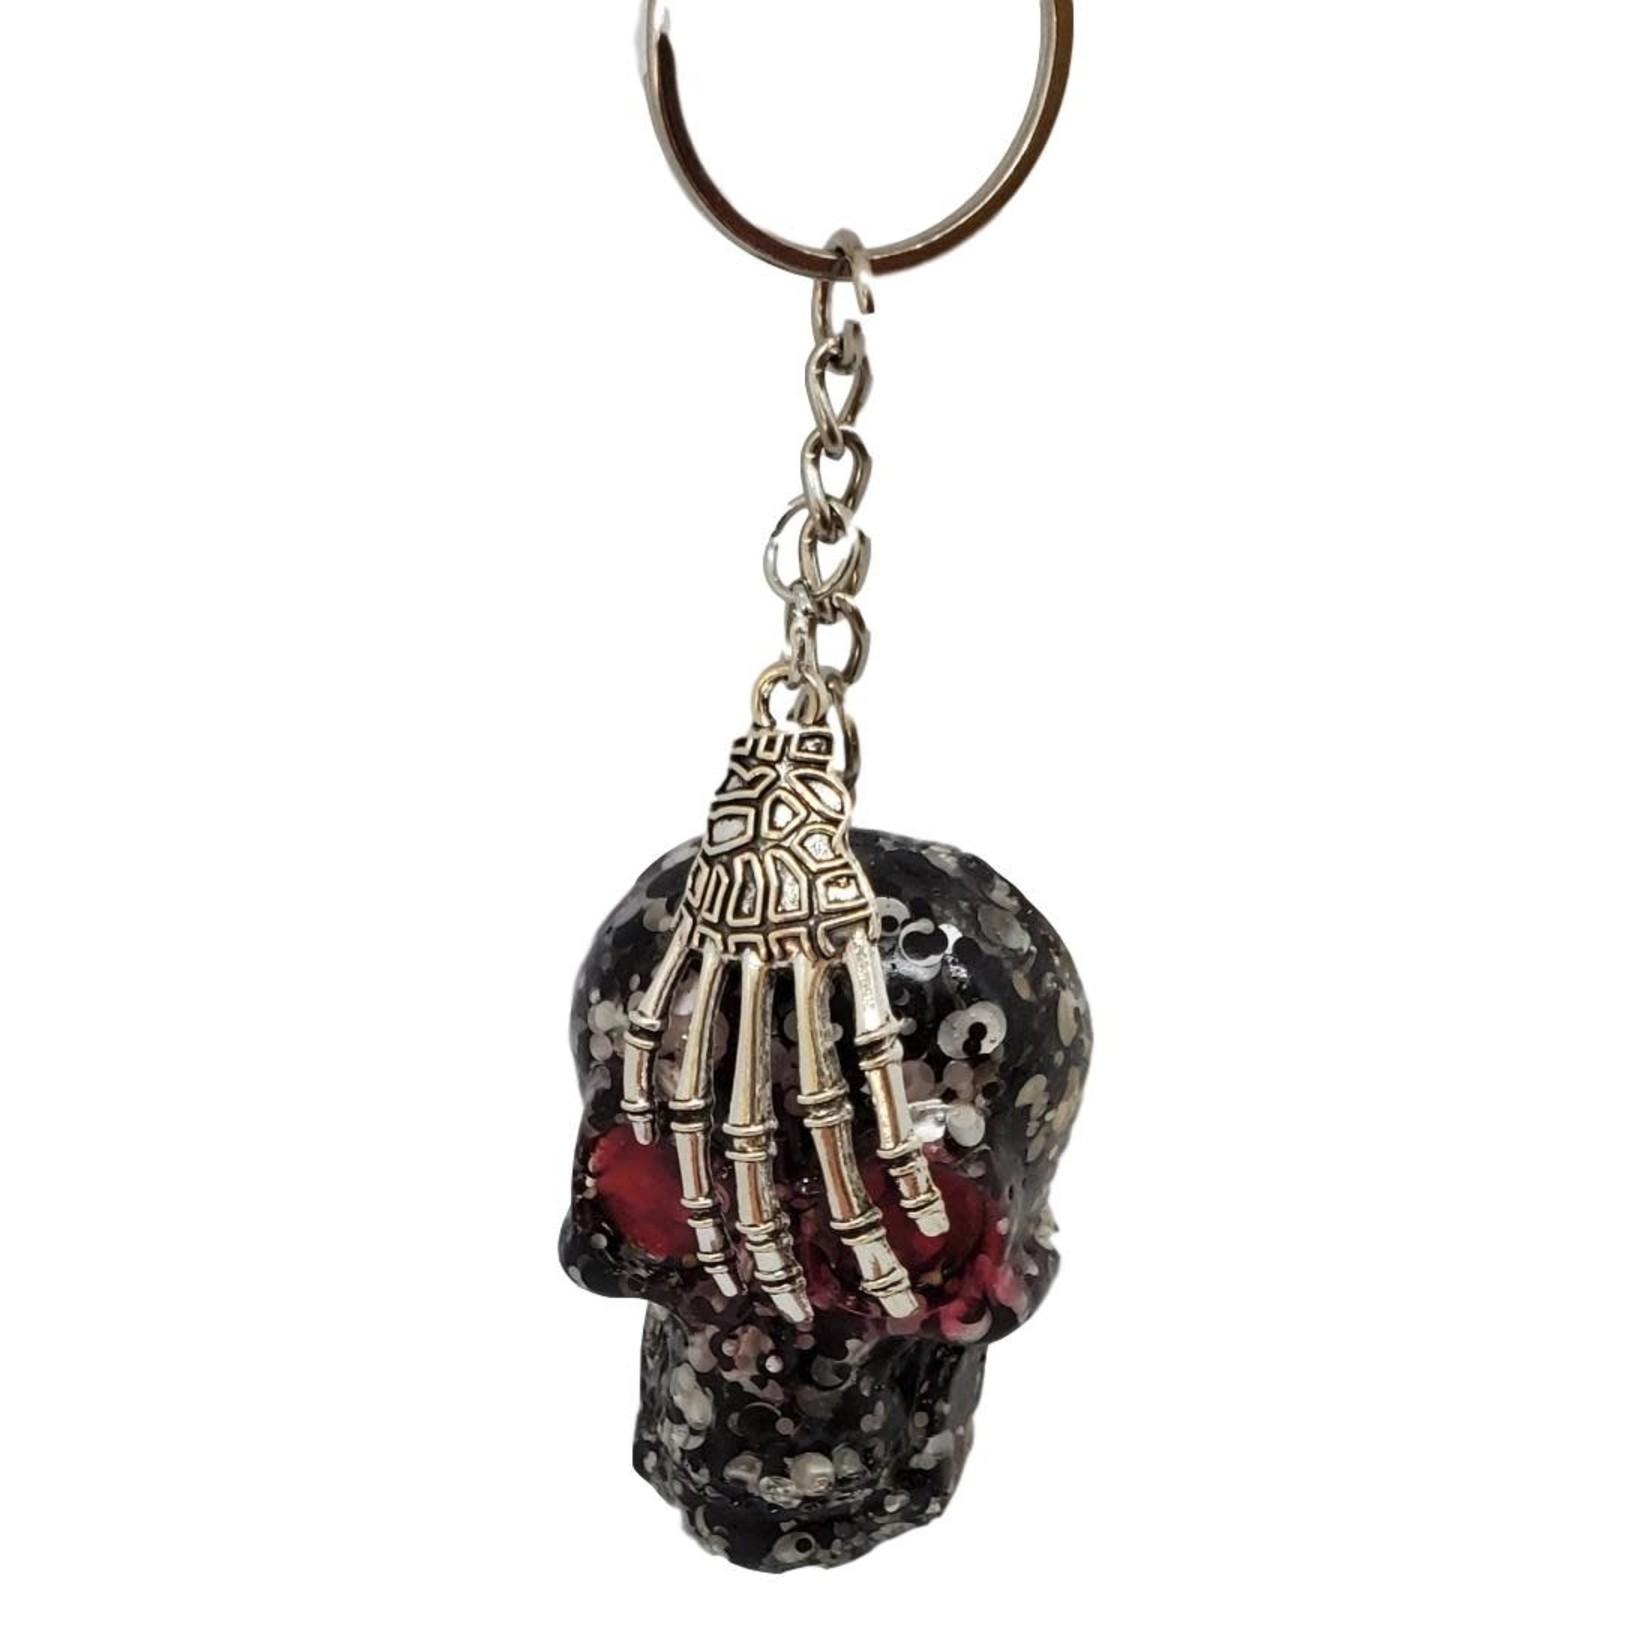 East Coast Sirens Black & White Skull Key Chain